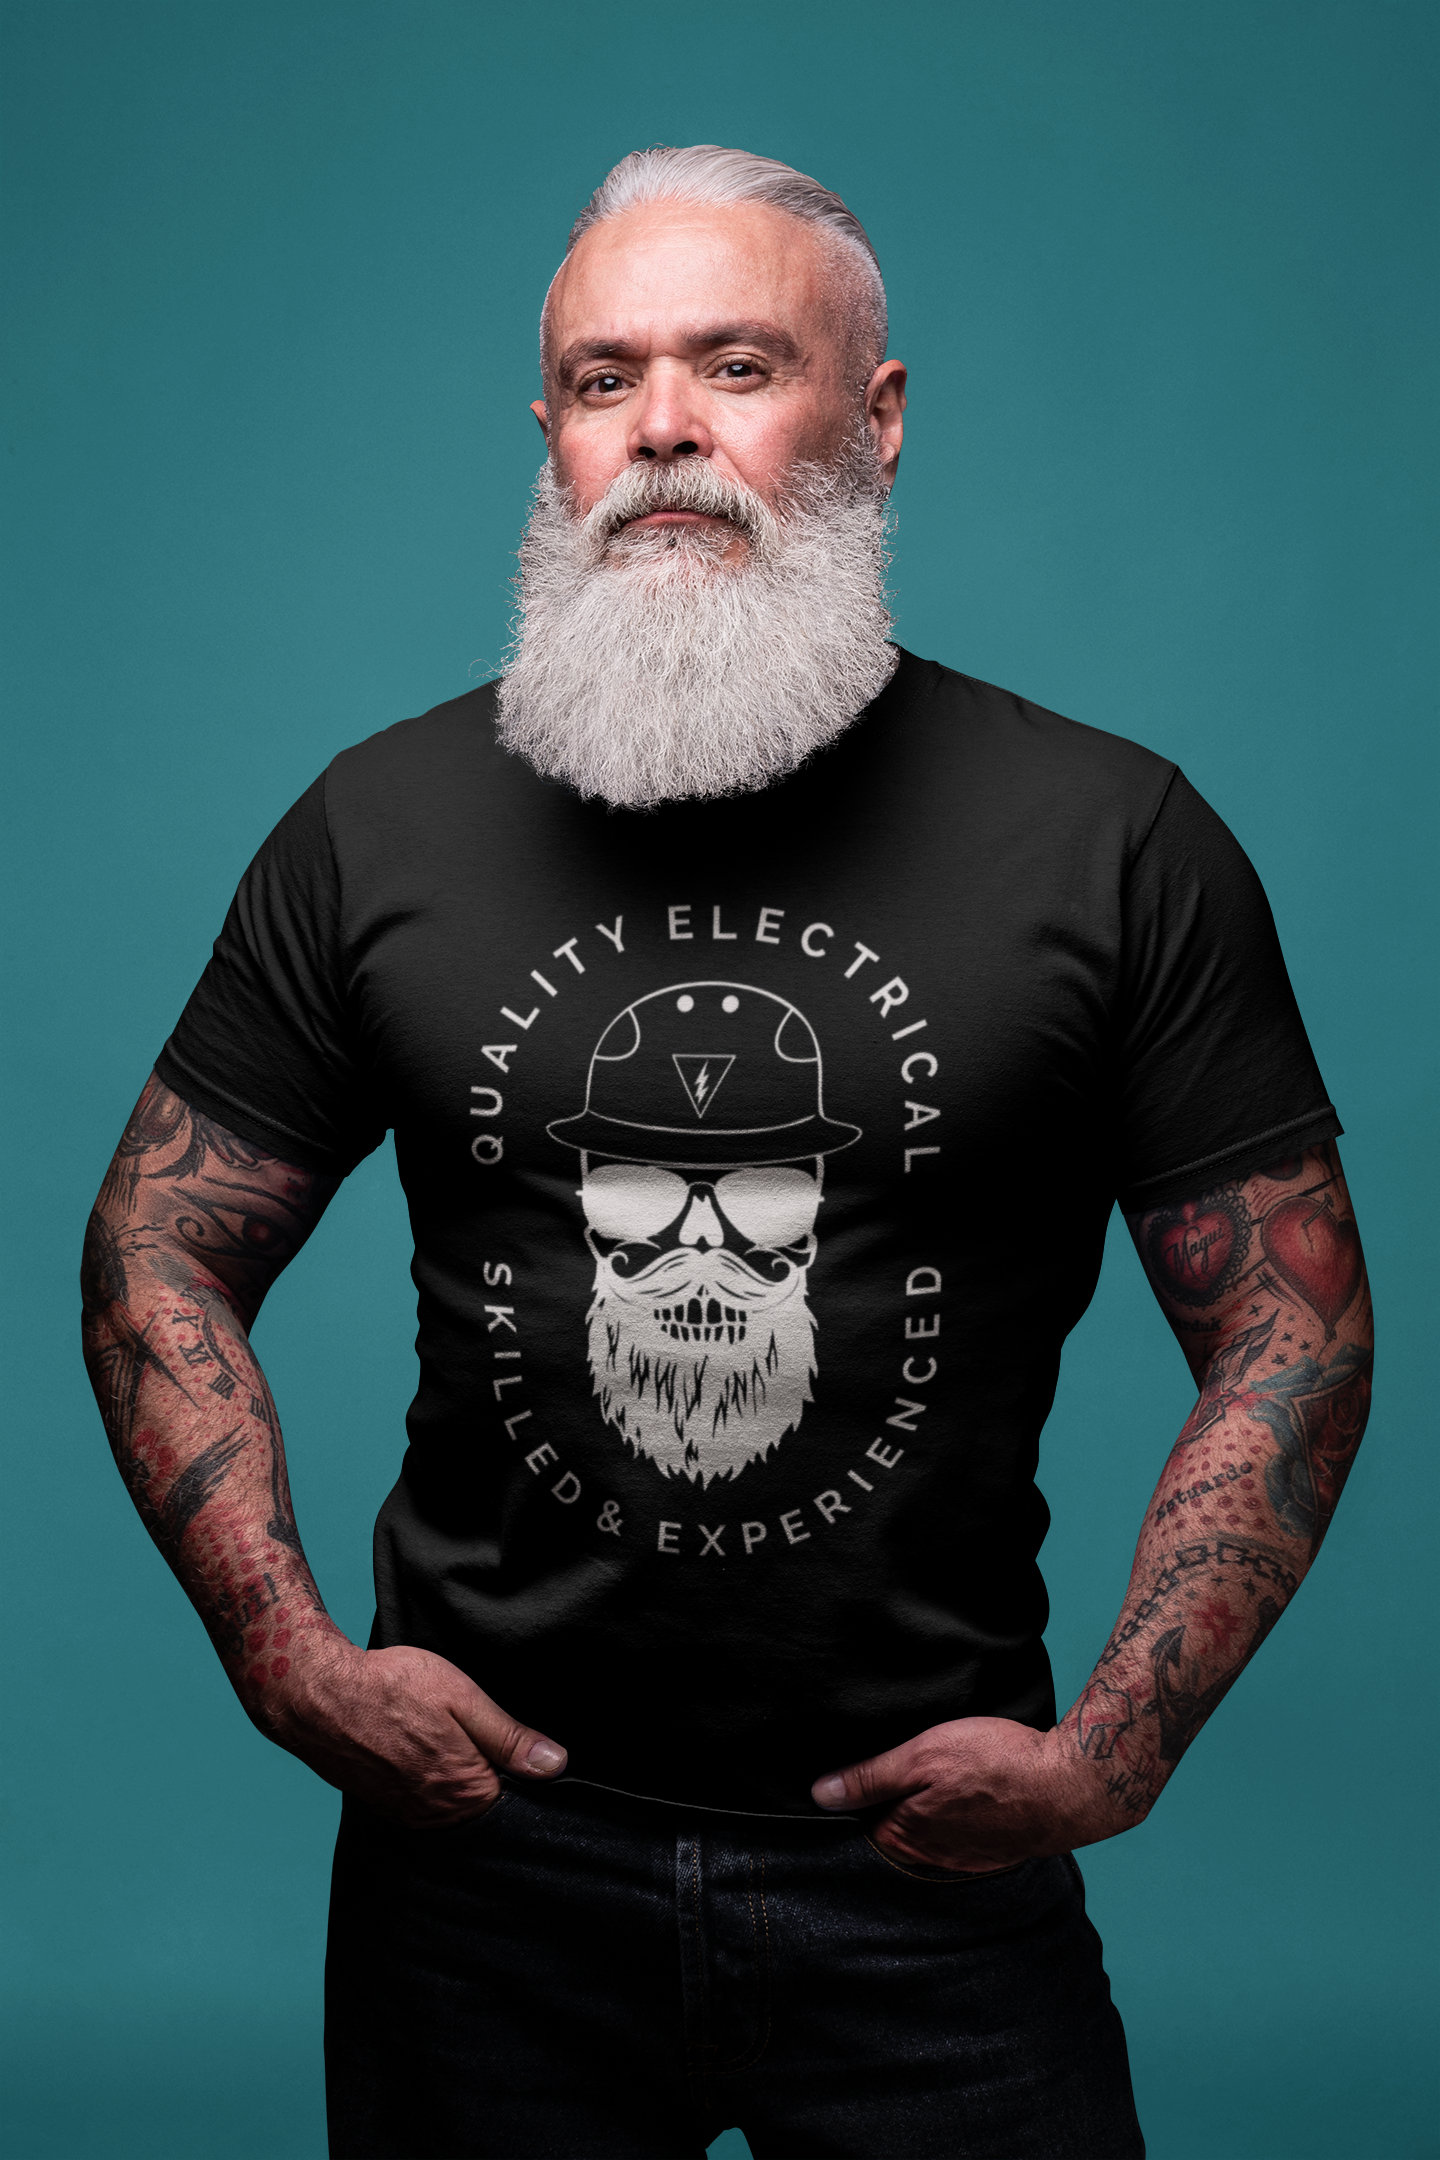 t-shirt-mockup-of-an-edgy-bearded-senior-23378.png